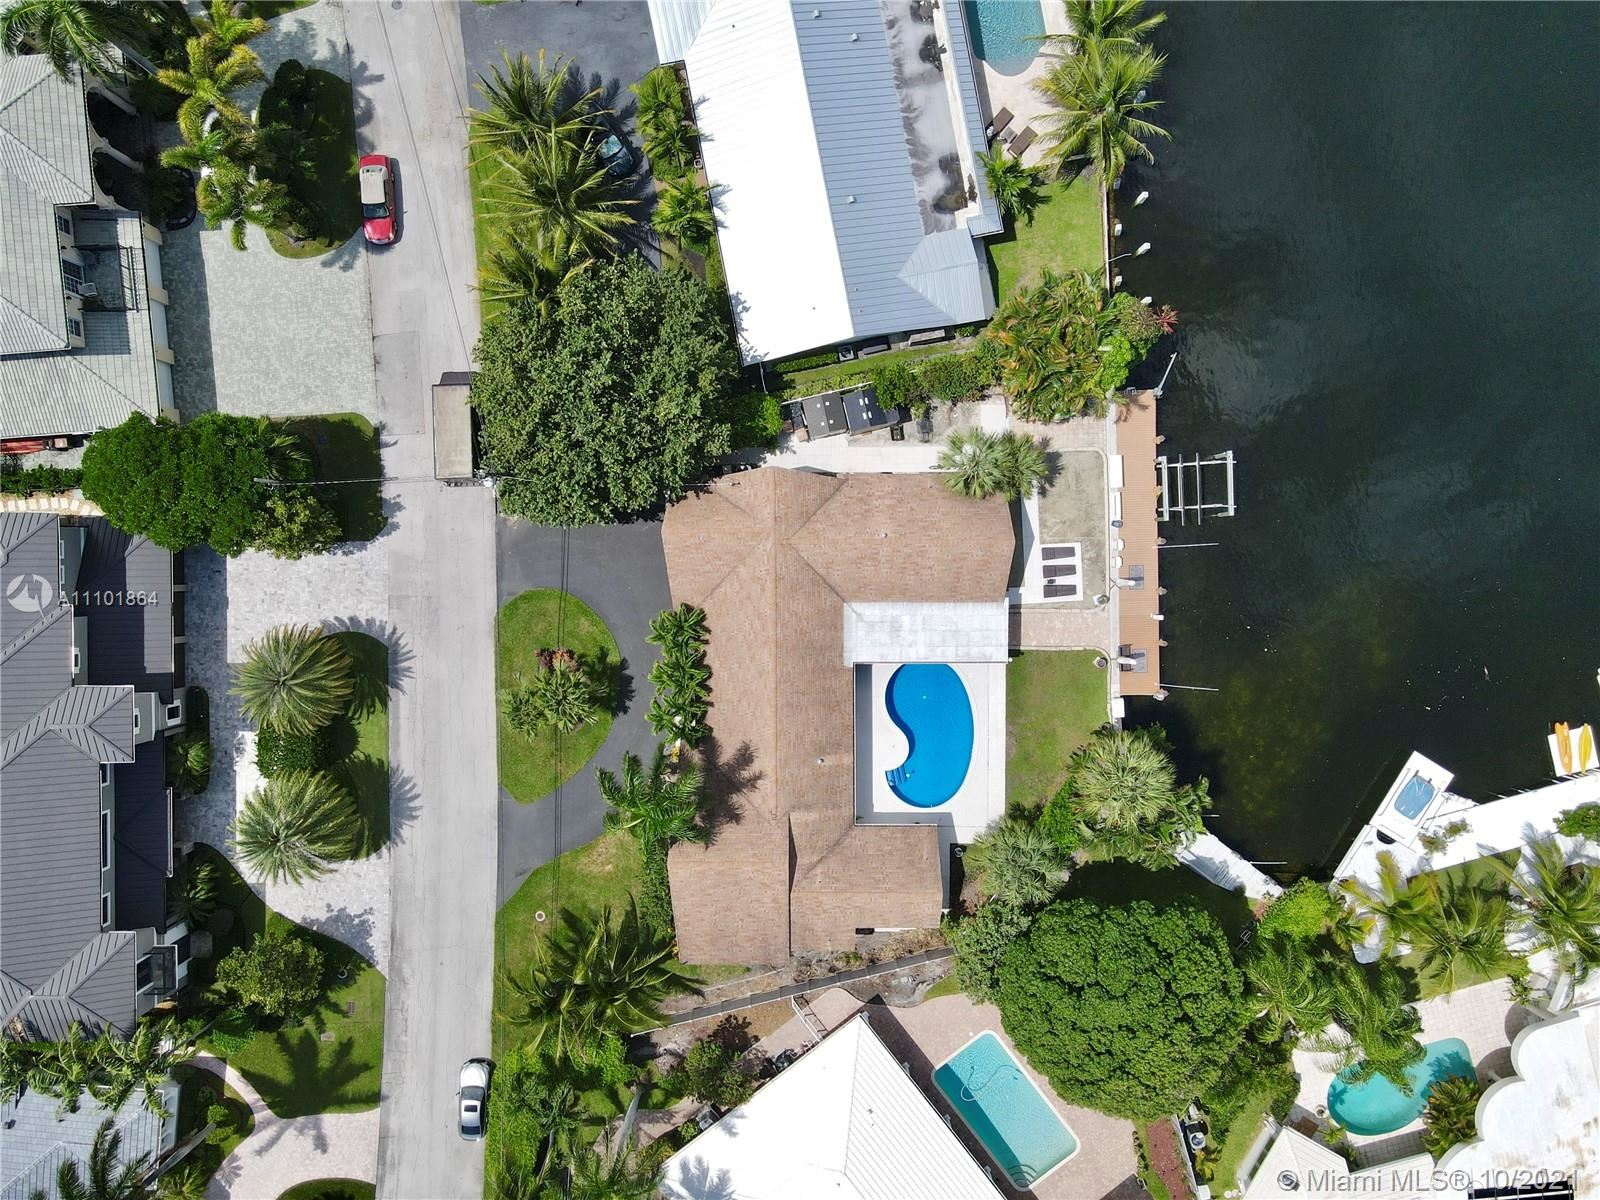 Photo of 2511 NE 33rd St, Lighthouse Point, FL 33064 (MLS # A11101864)